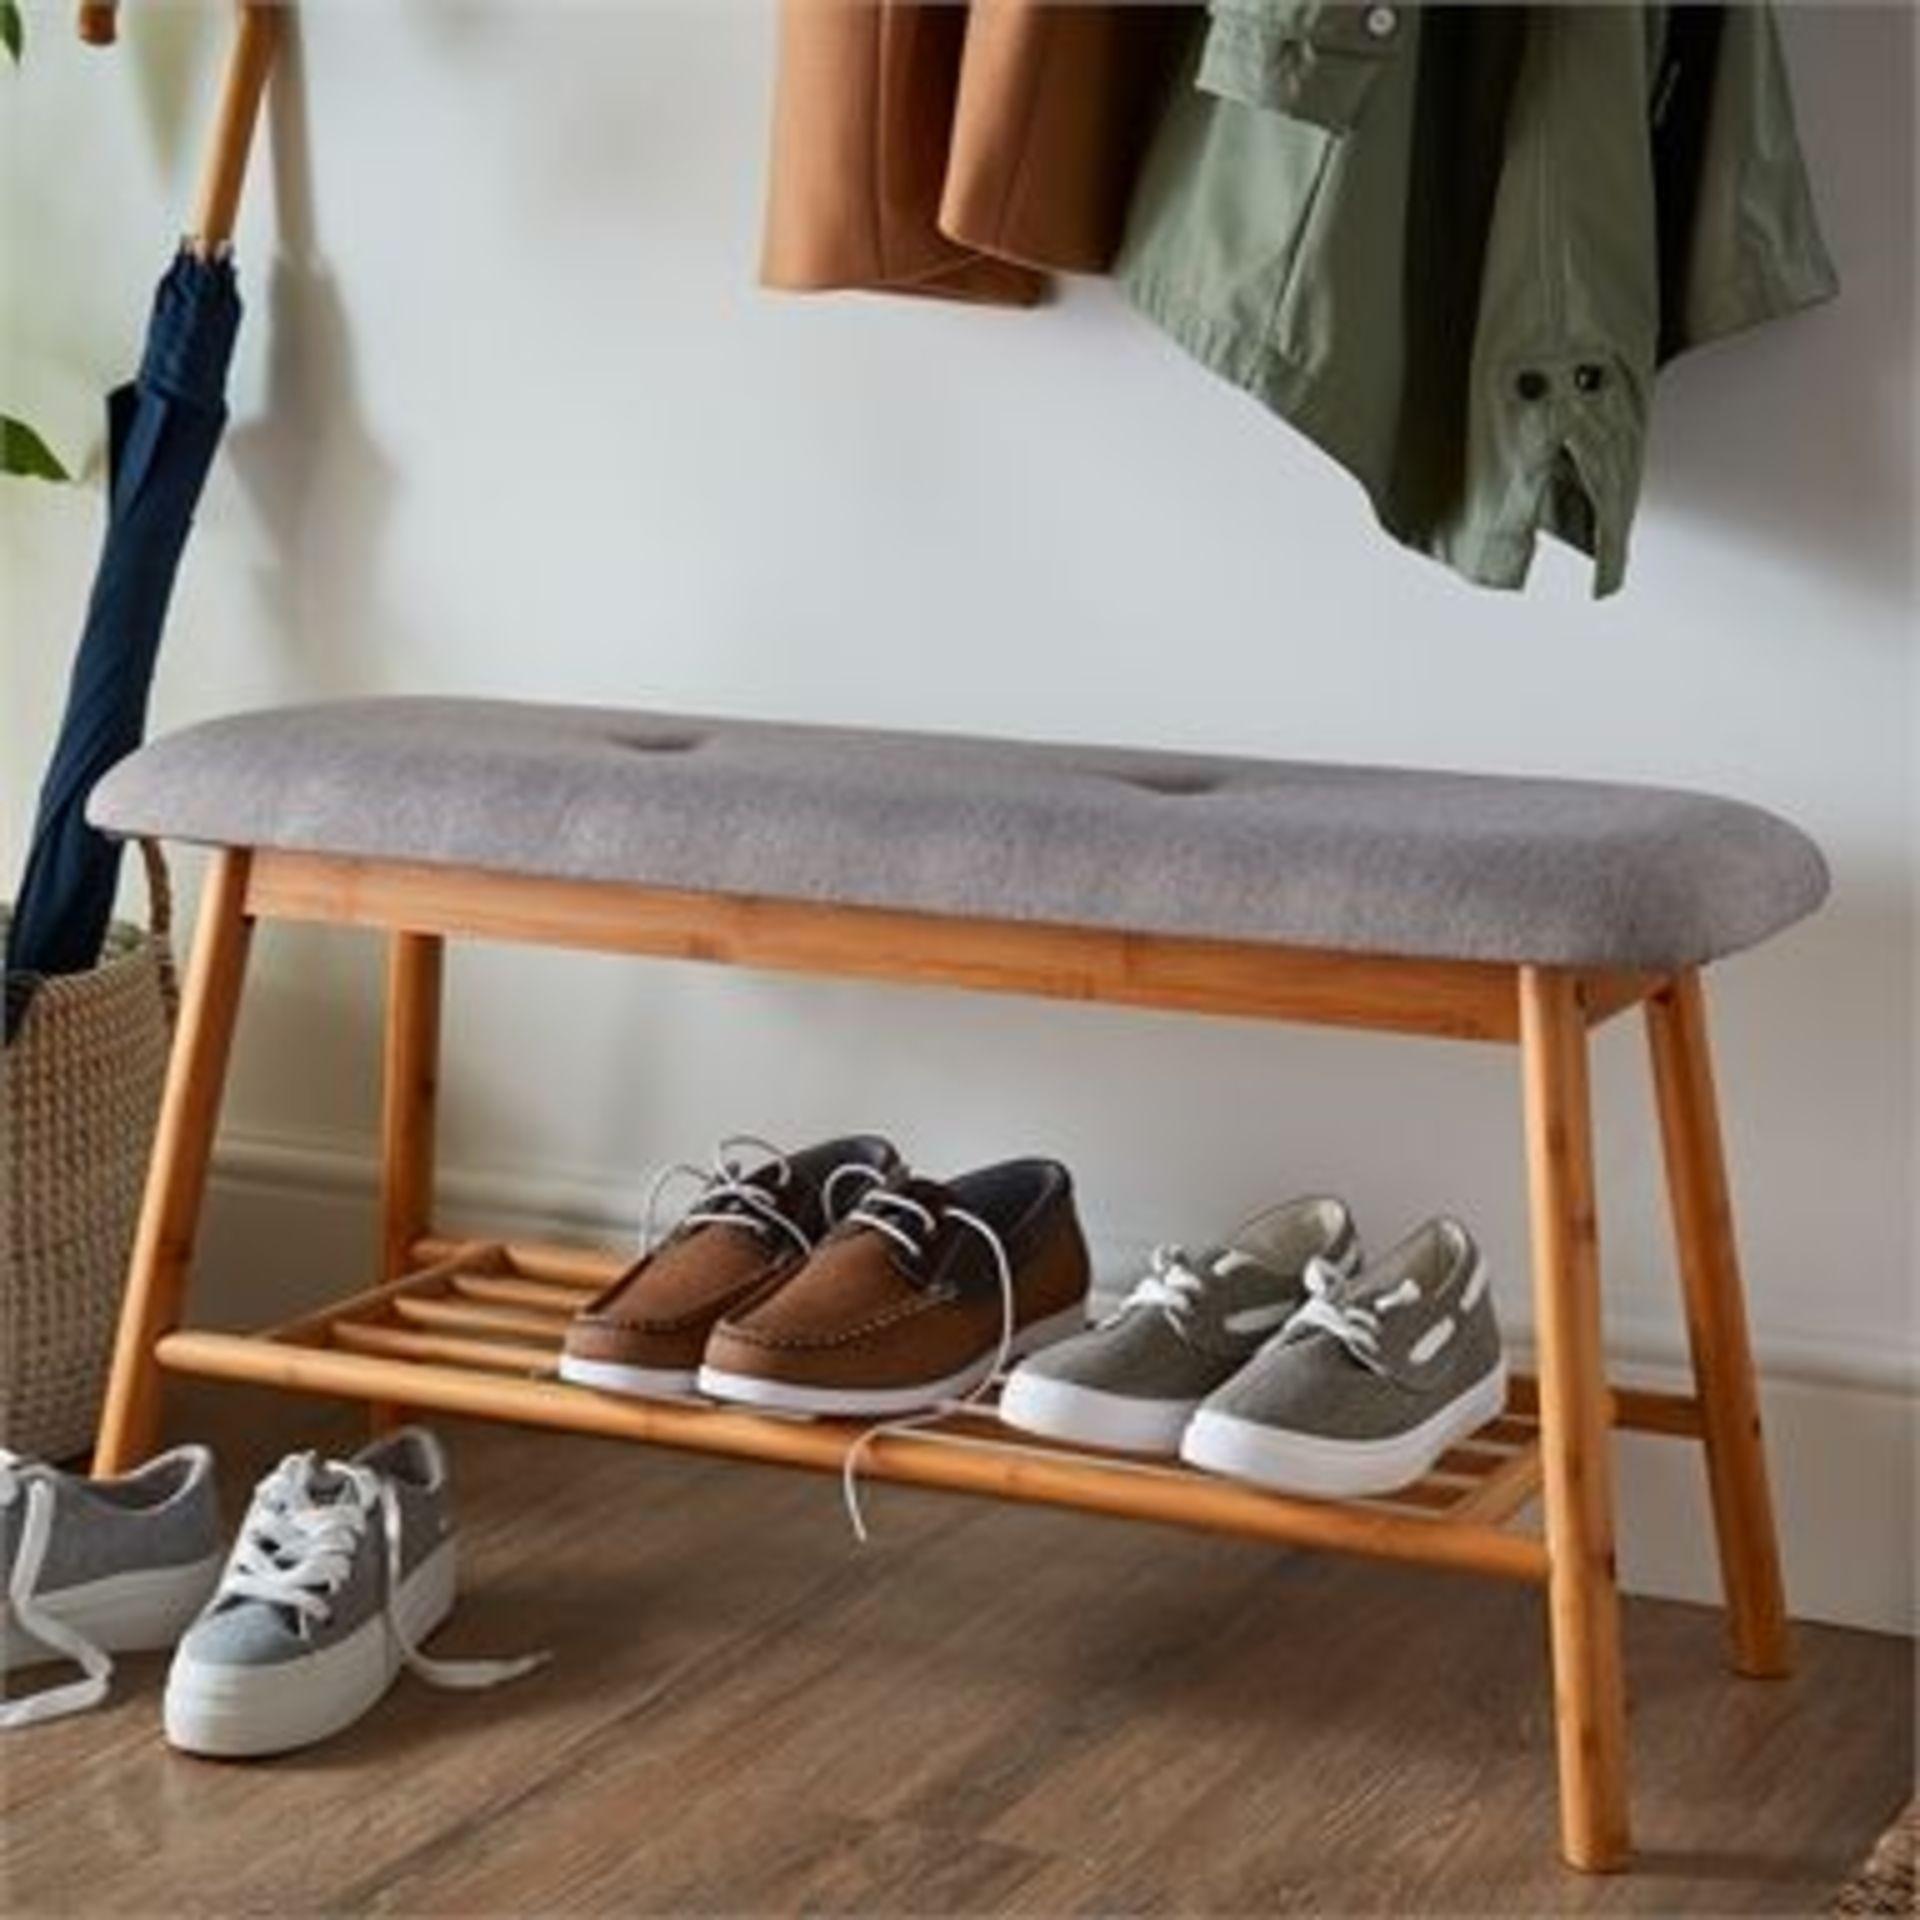 (3E) 2x Items. 1x Living Elements Bamboo Shoe Bench With Grey Cushion Seat. 1x VidaXL.com Radiator